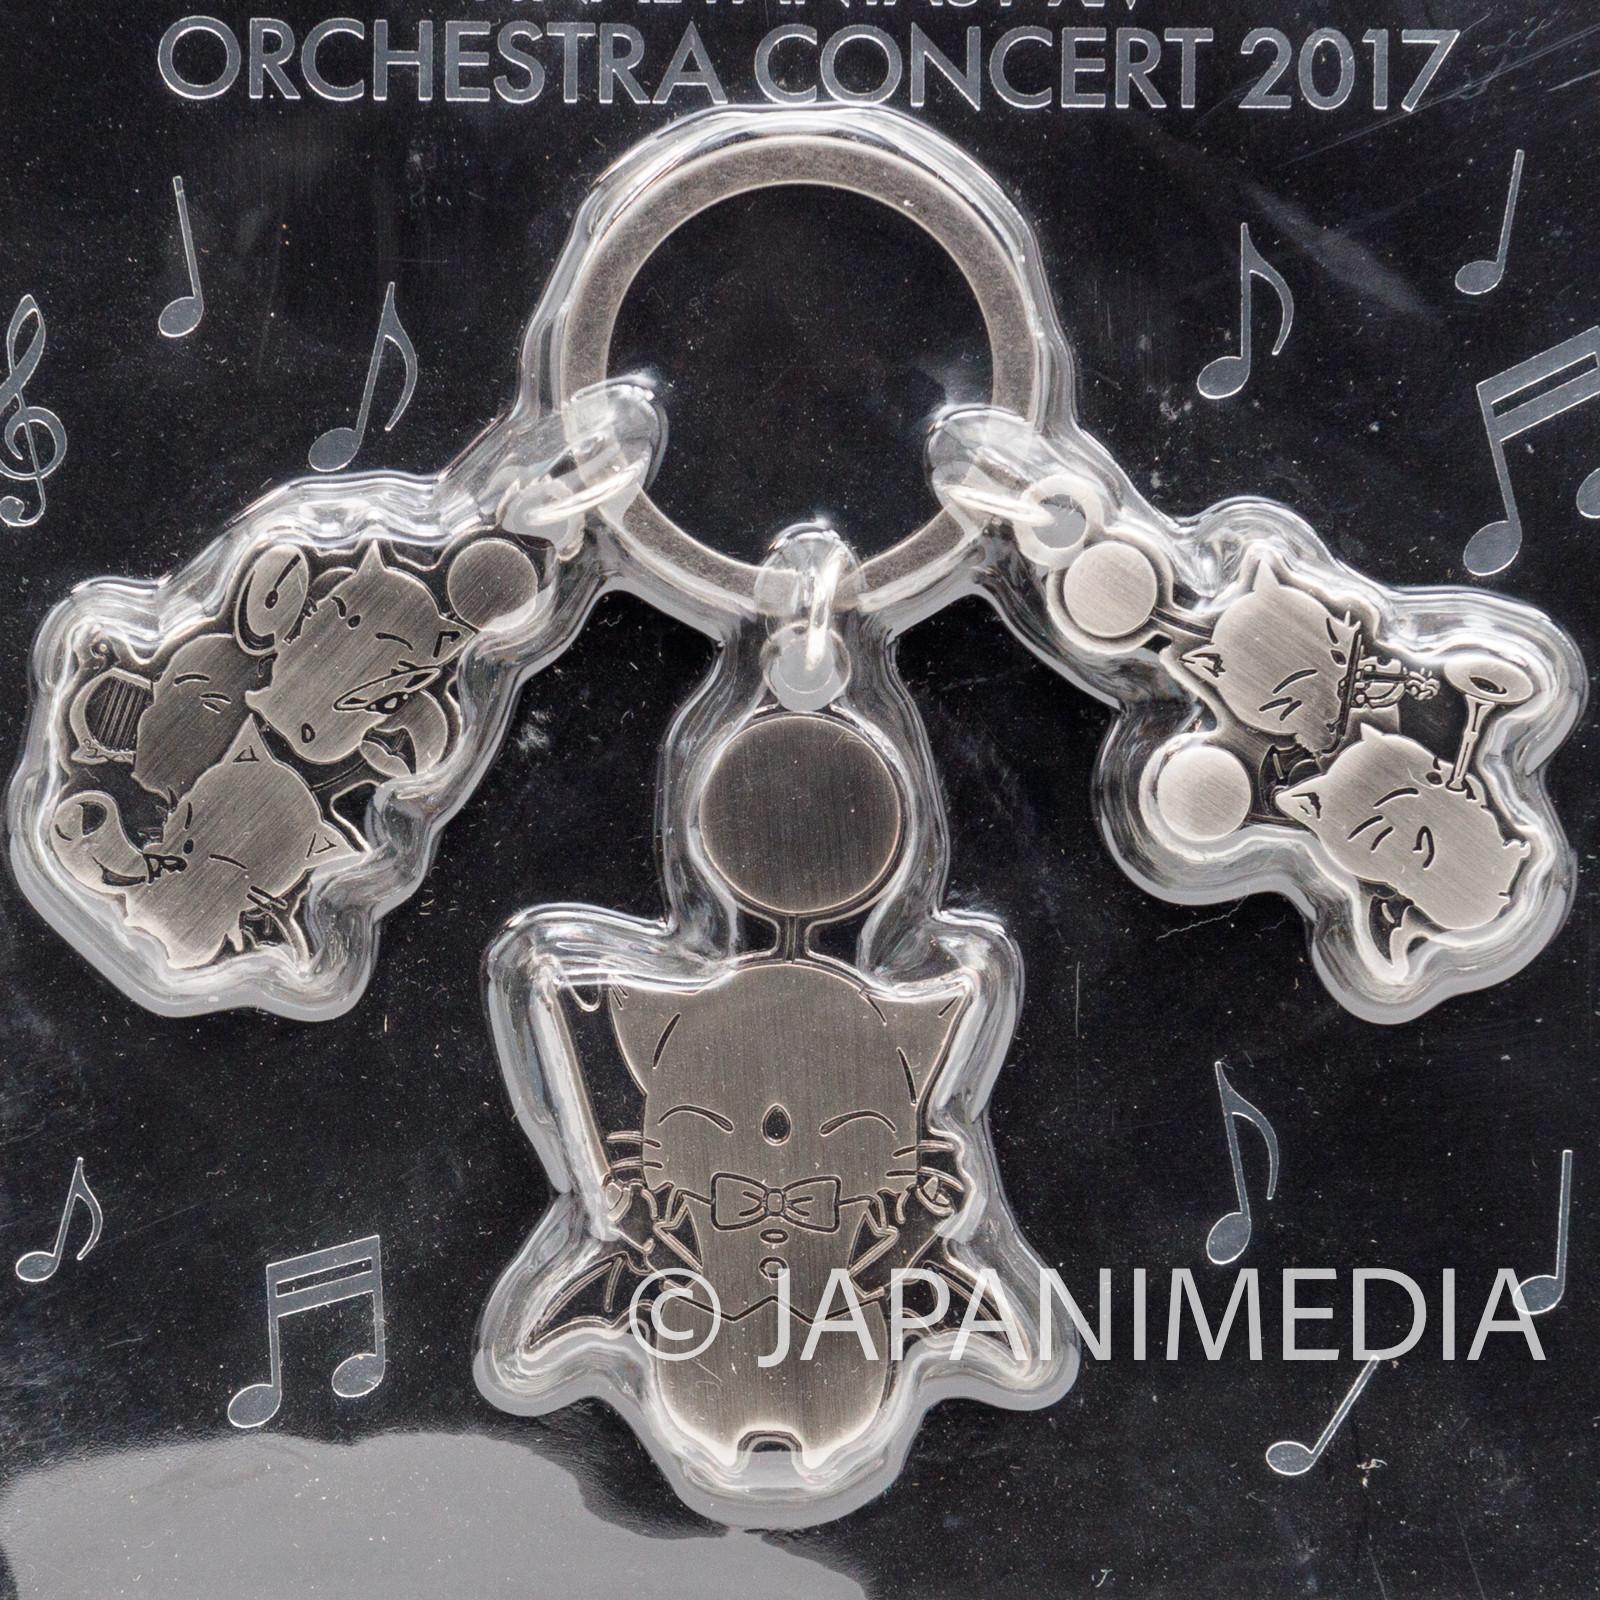 FINAL FANTASY XIV 14 Moogle Metal Charm Orchestra Concert 2017 SQUARE ENIX